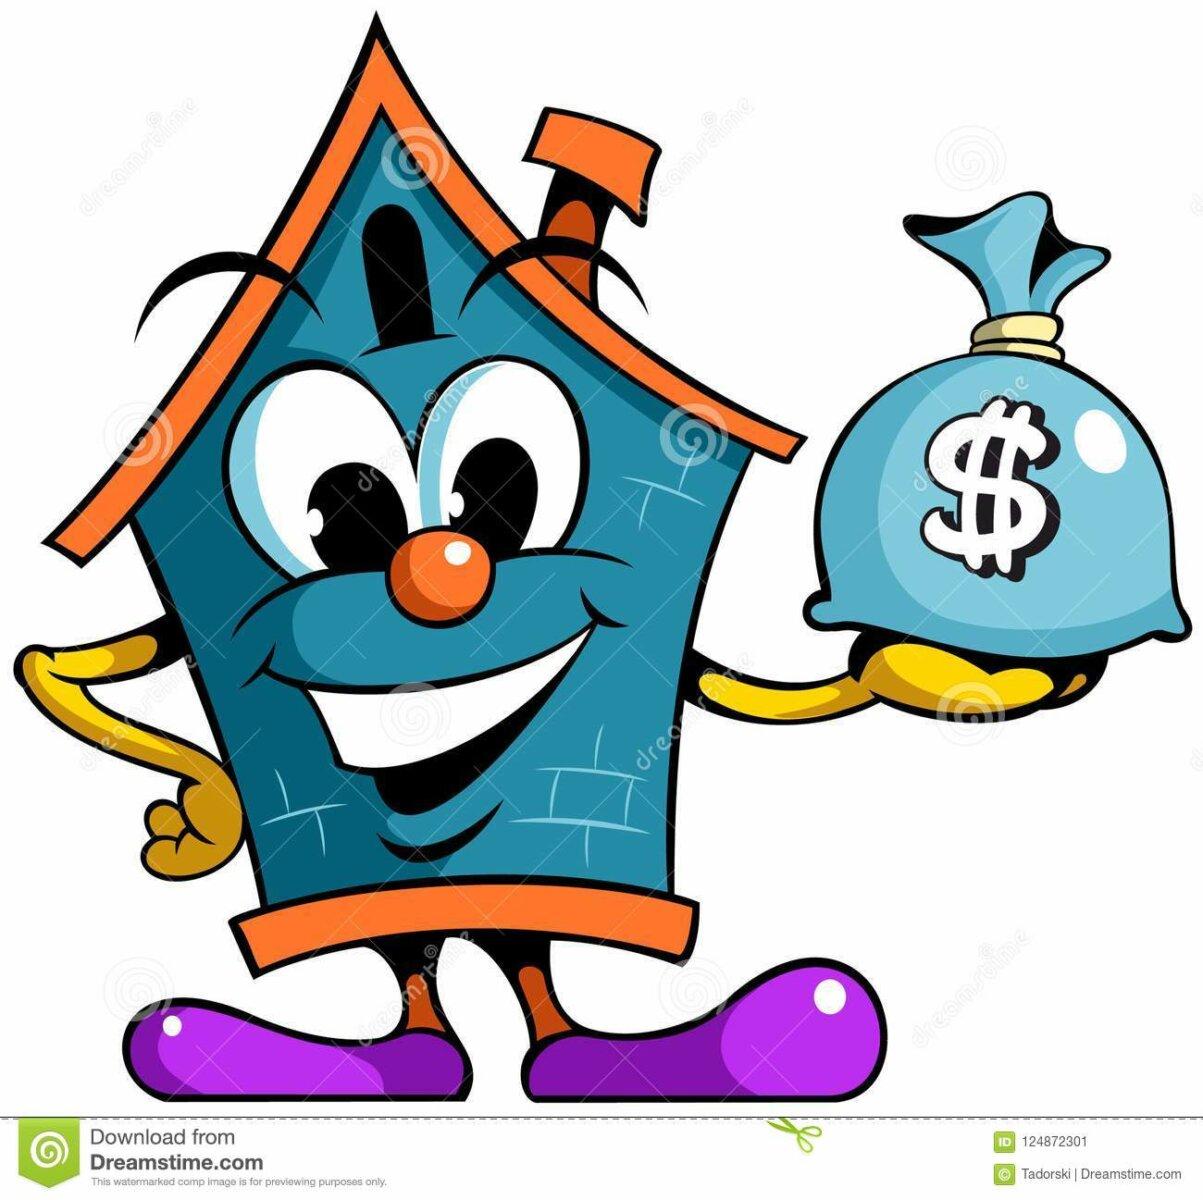 We Buy Houses Bertram texas